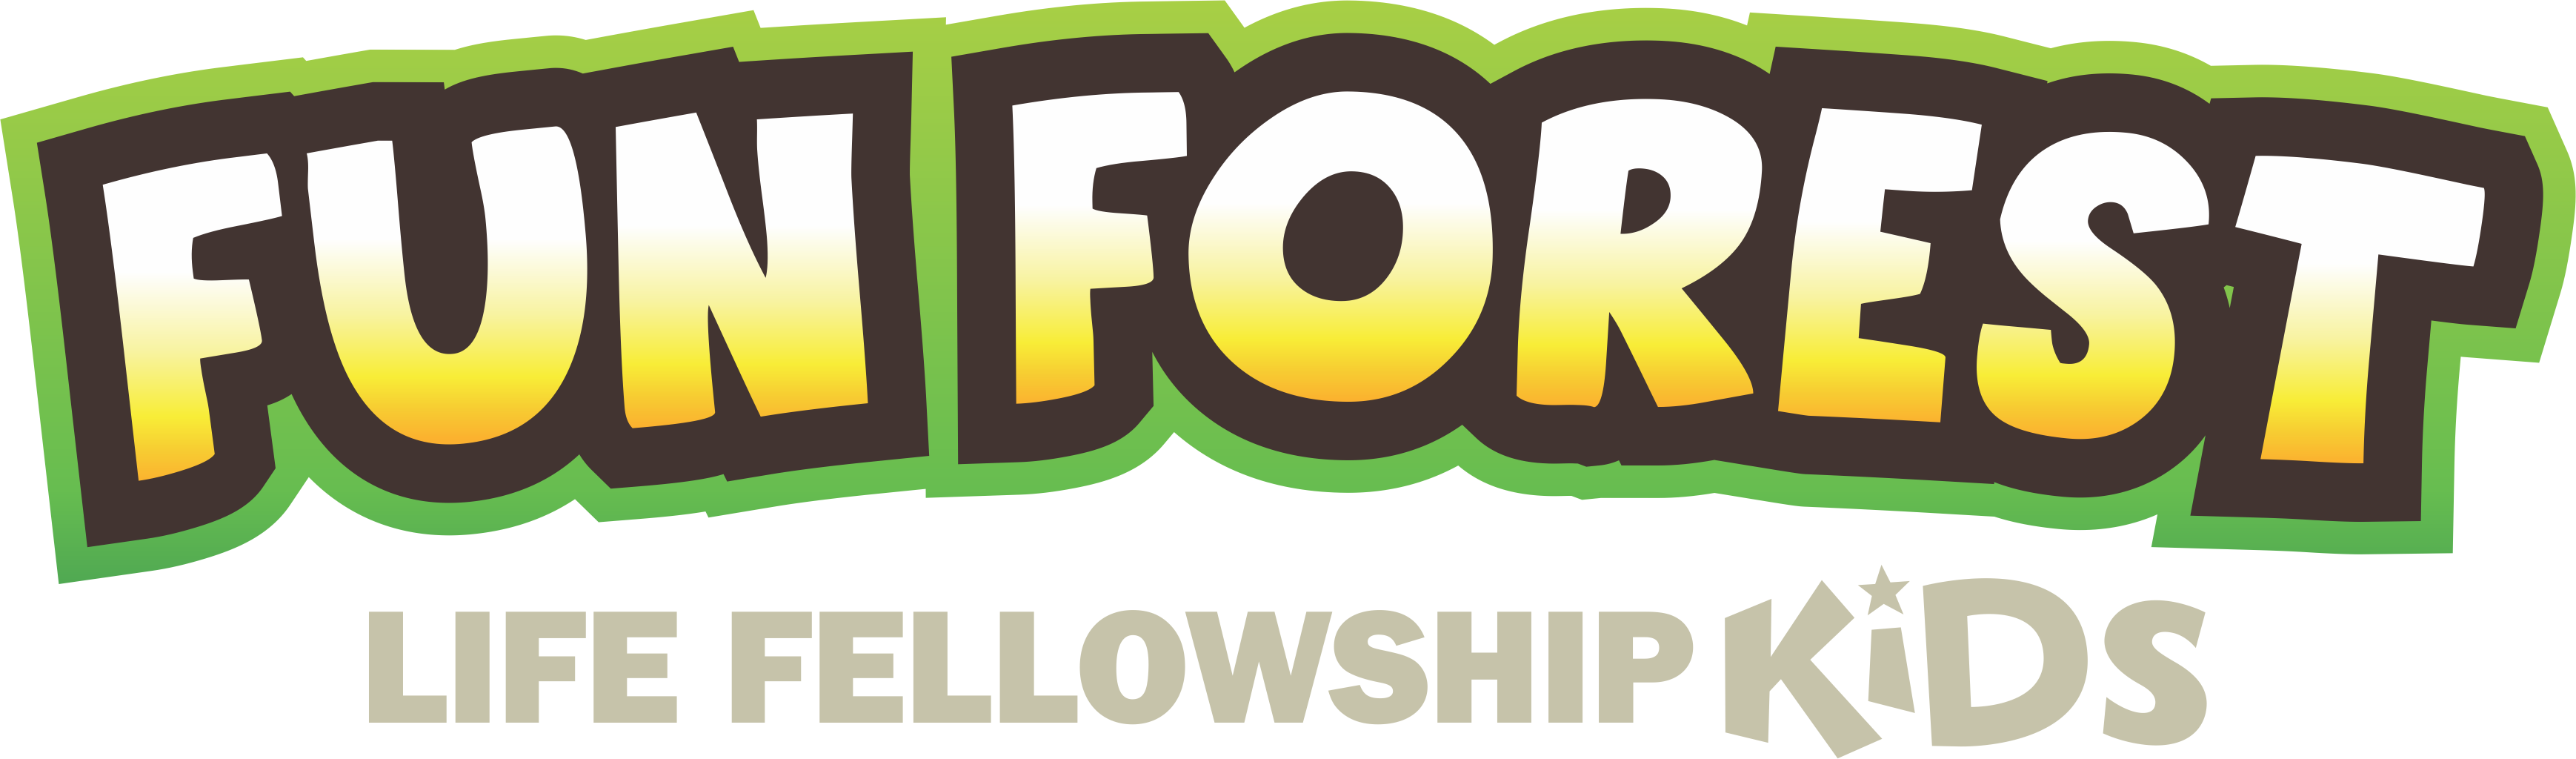 Fun Forest Kids